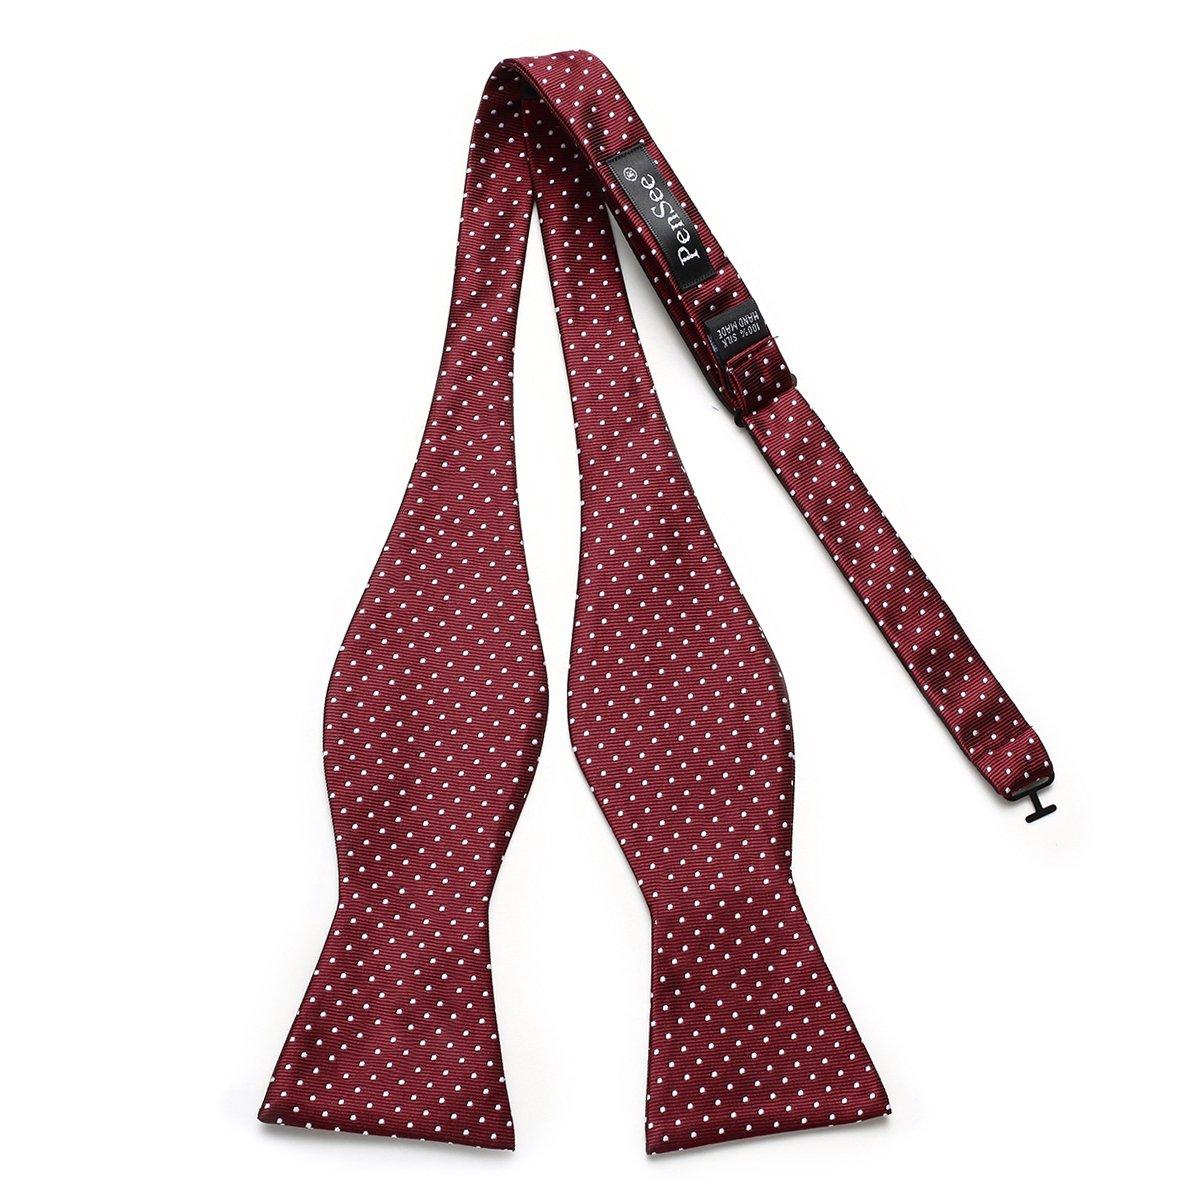 PenSee Mens Self Bow Tie Polka Dots Woven Silk Bow Ties-Various Colors